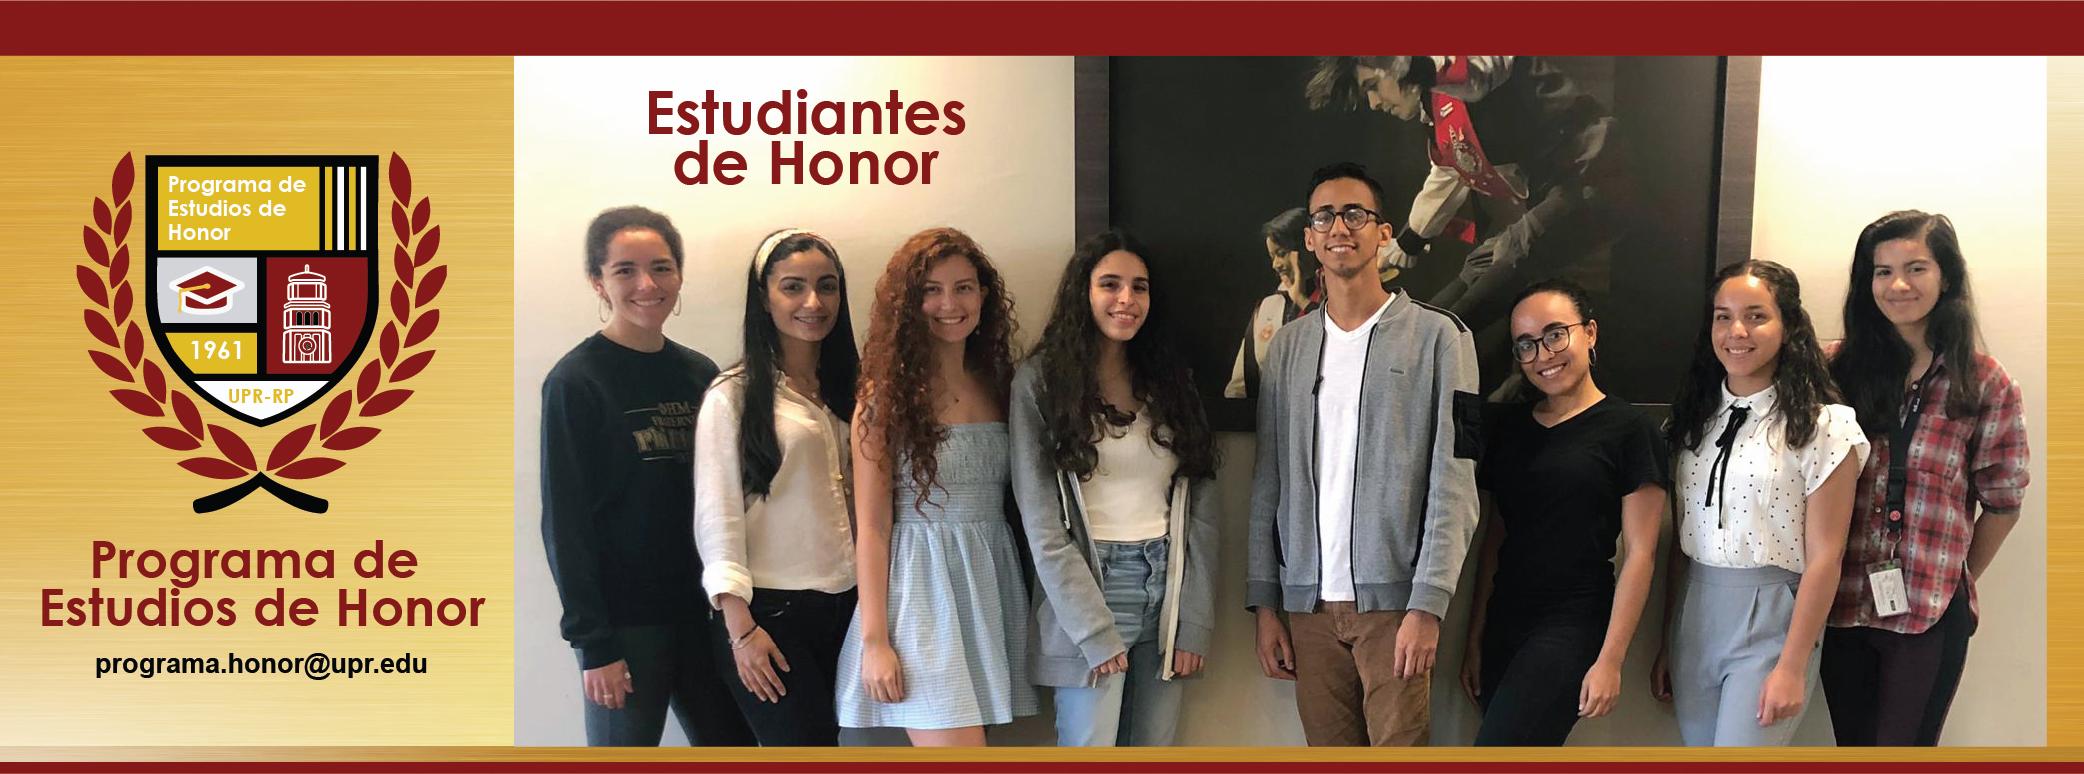 Estudiantes del programa banner